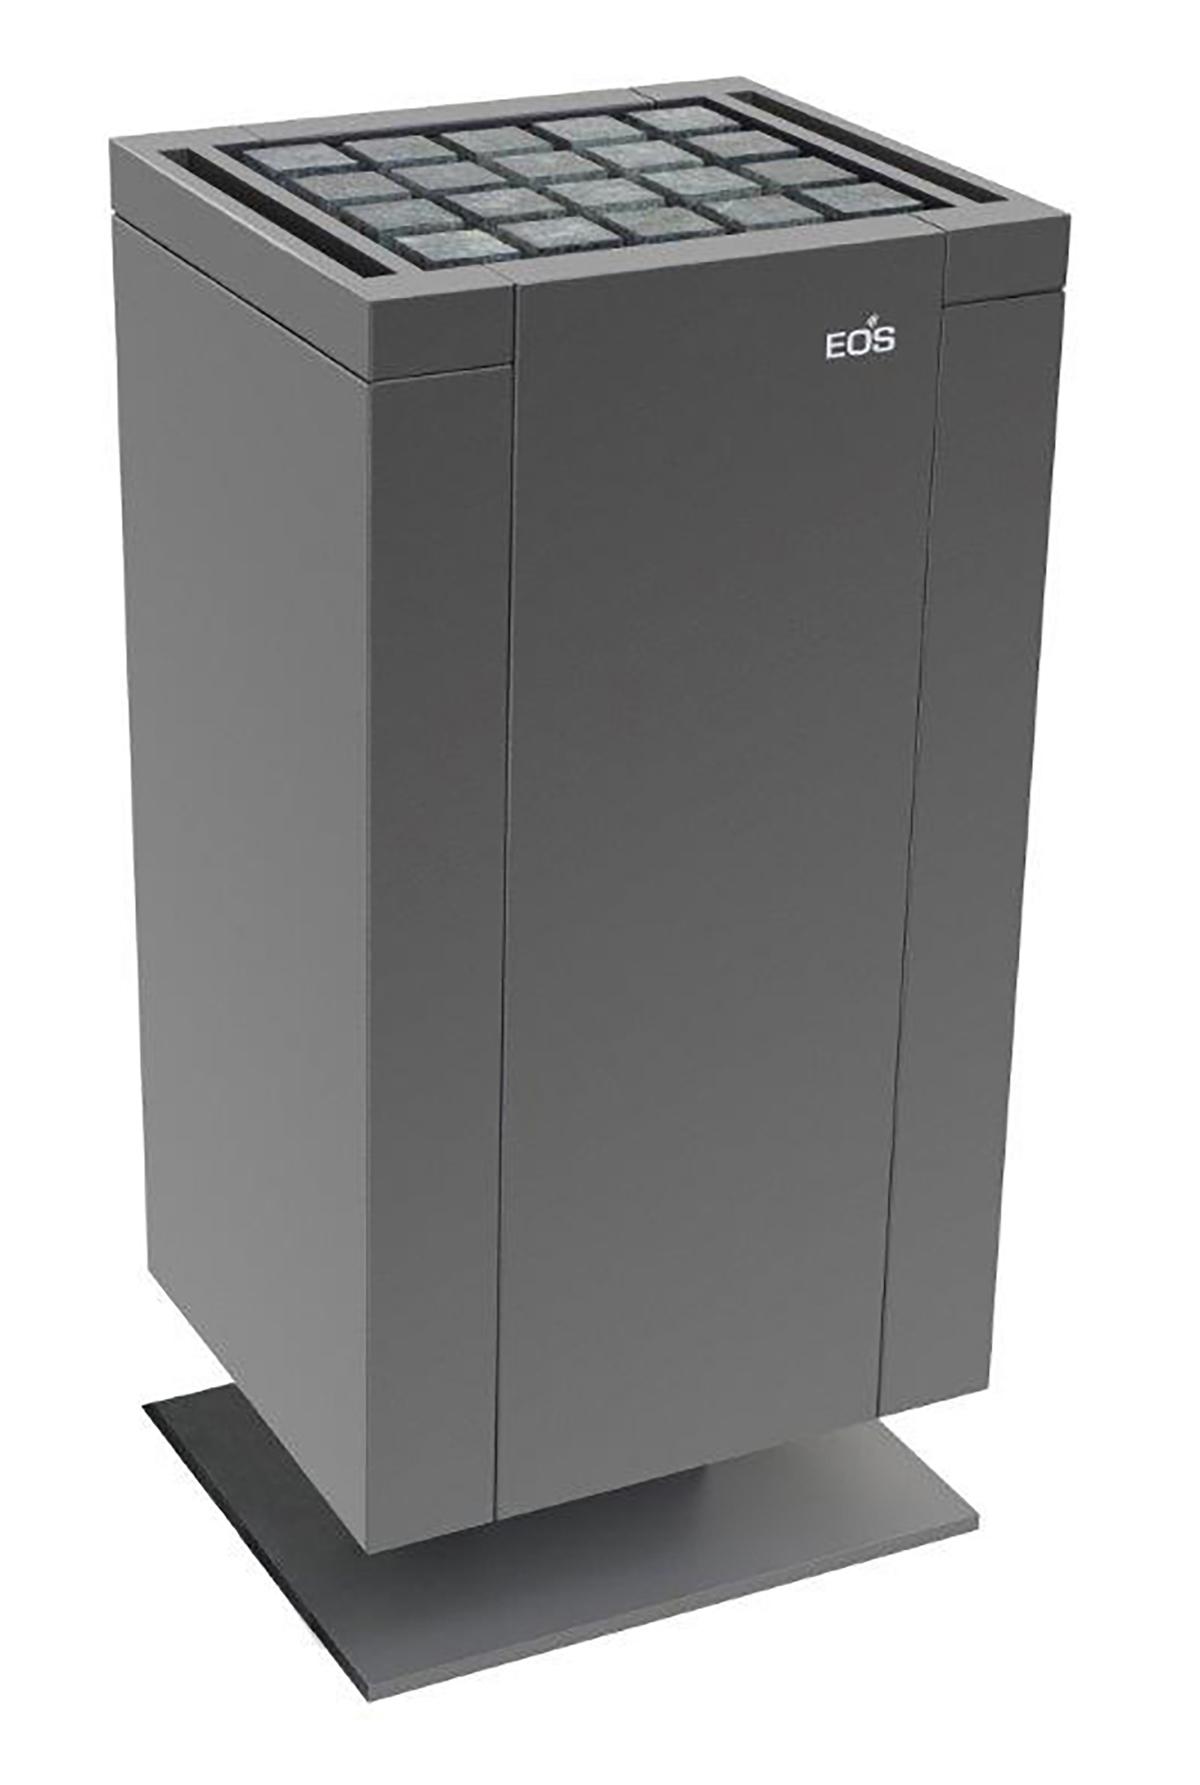 eos mythos s35 eos mythos s35 9 0 kw. Black Bedroom Furniture Sets. Home Design Ideas